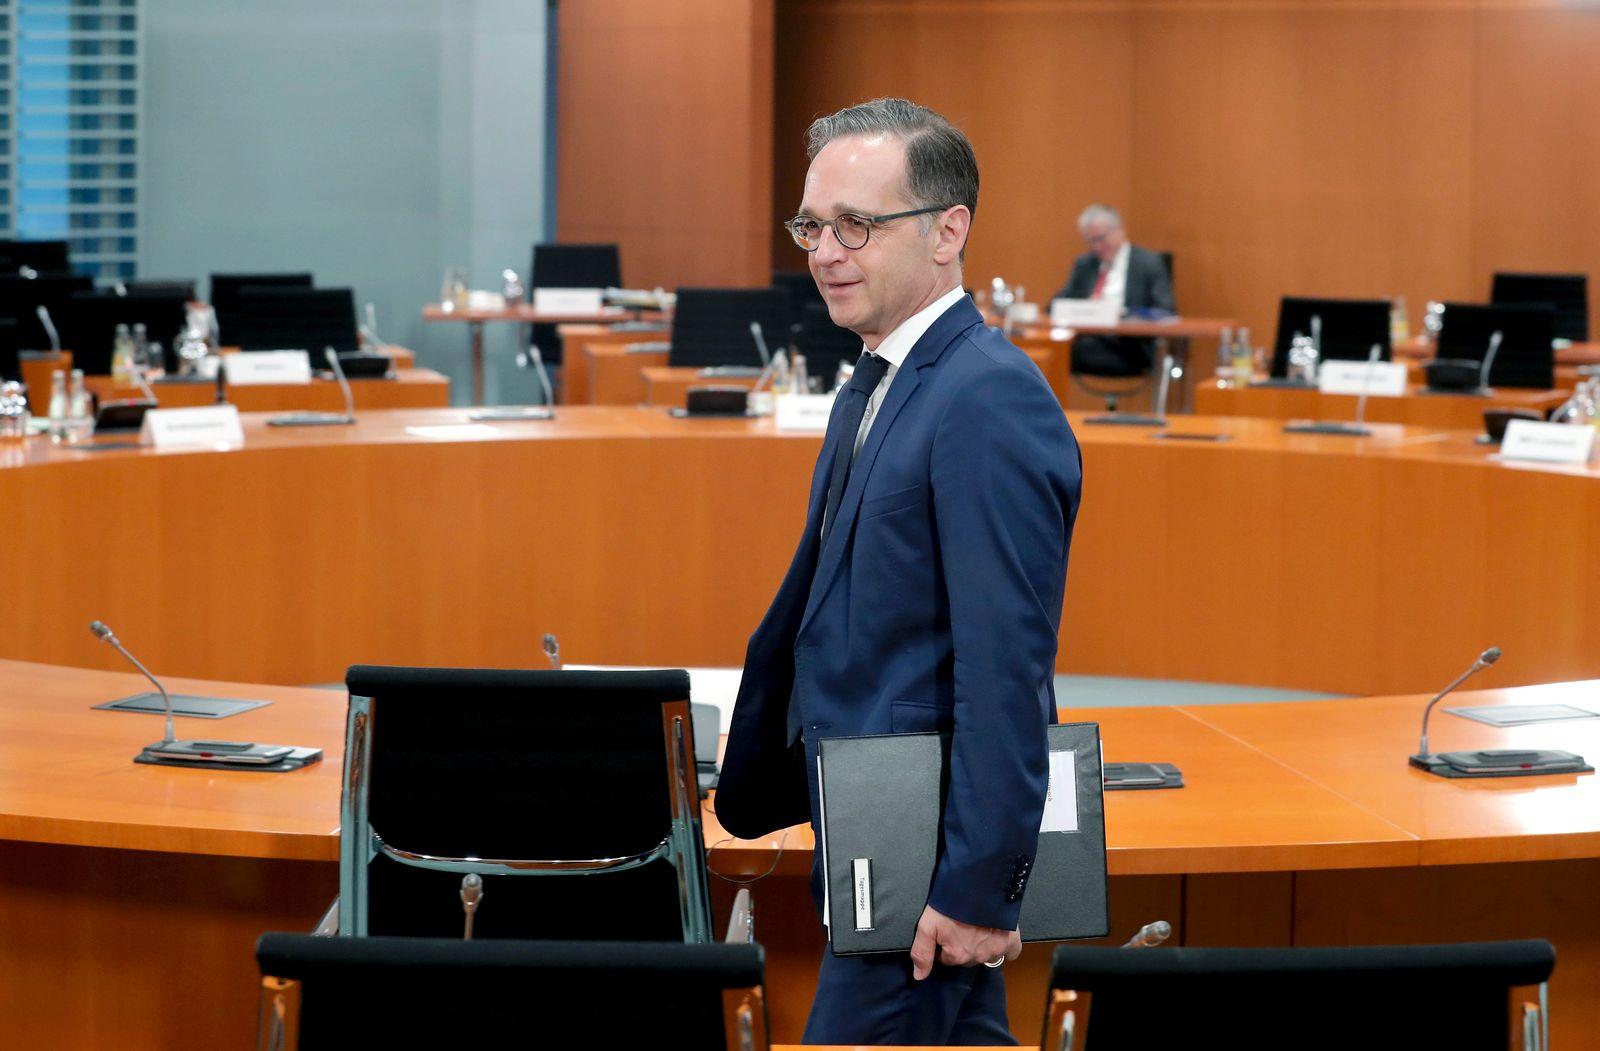 Bundeskabinett tagt